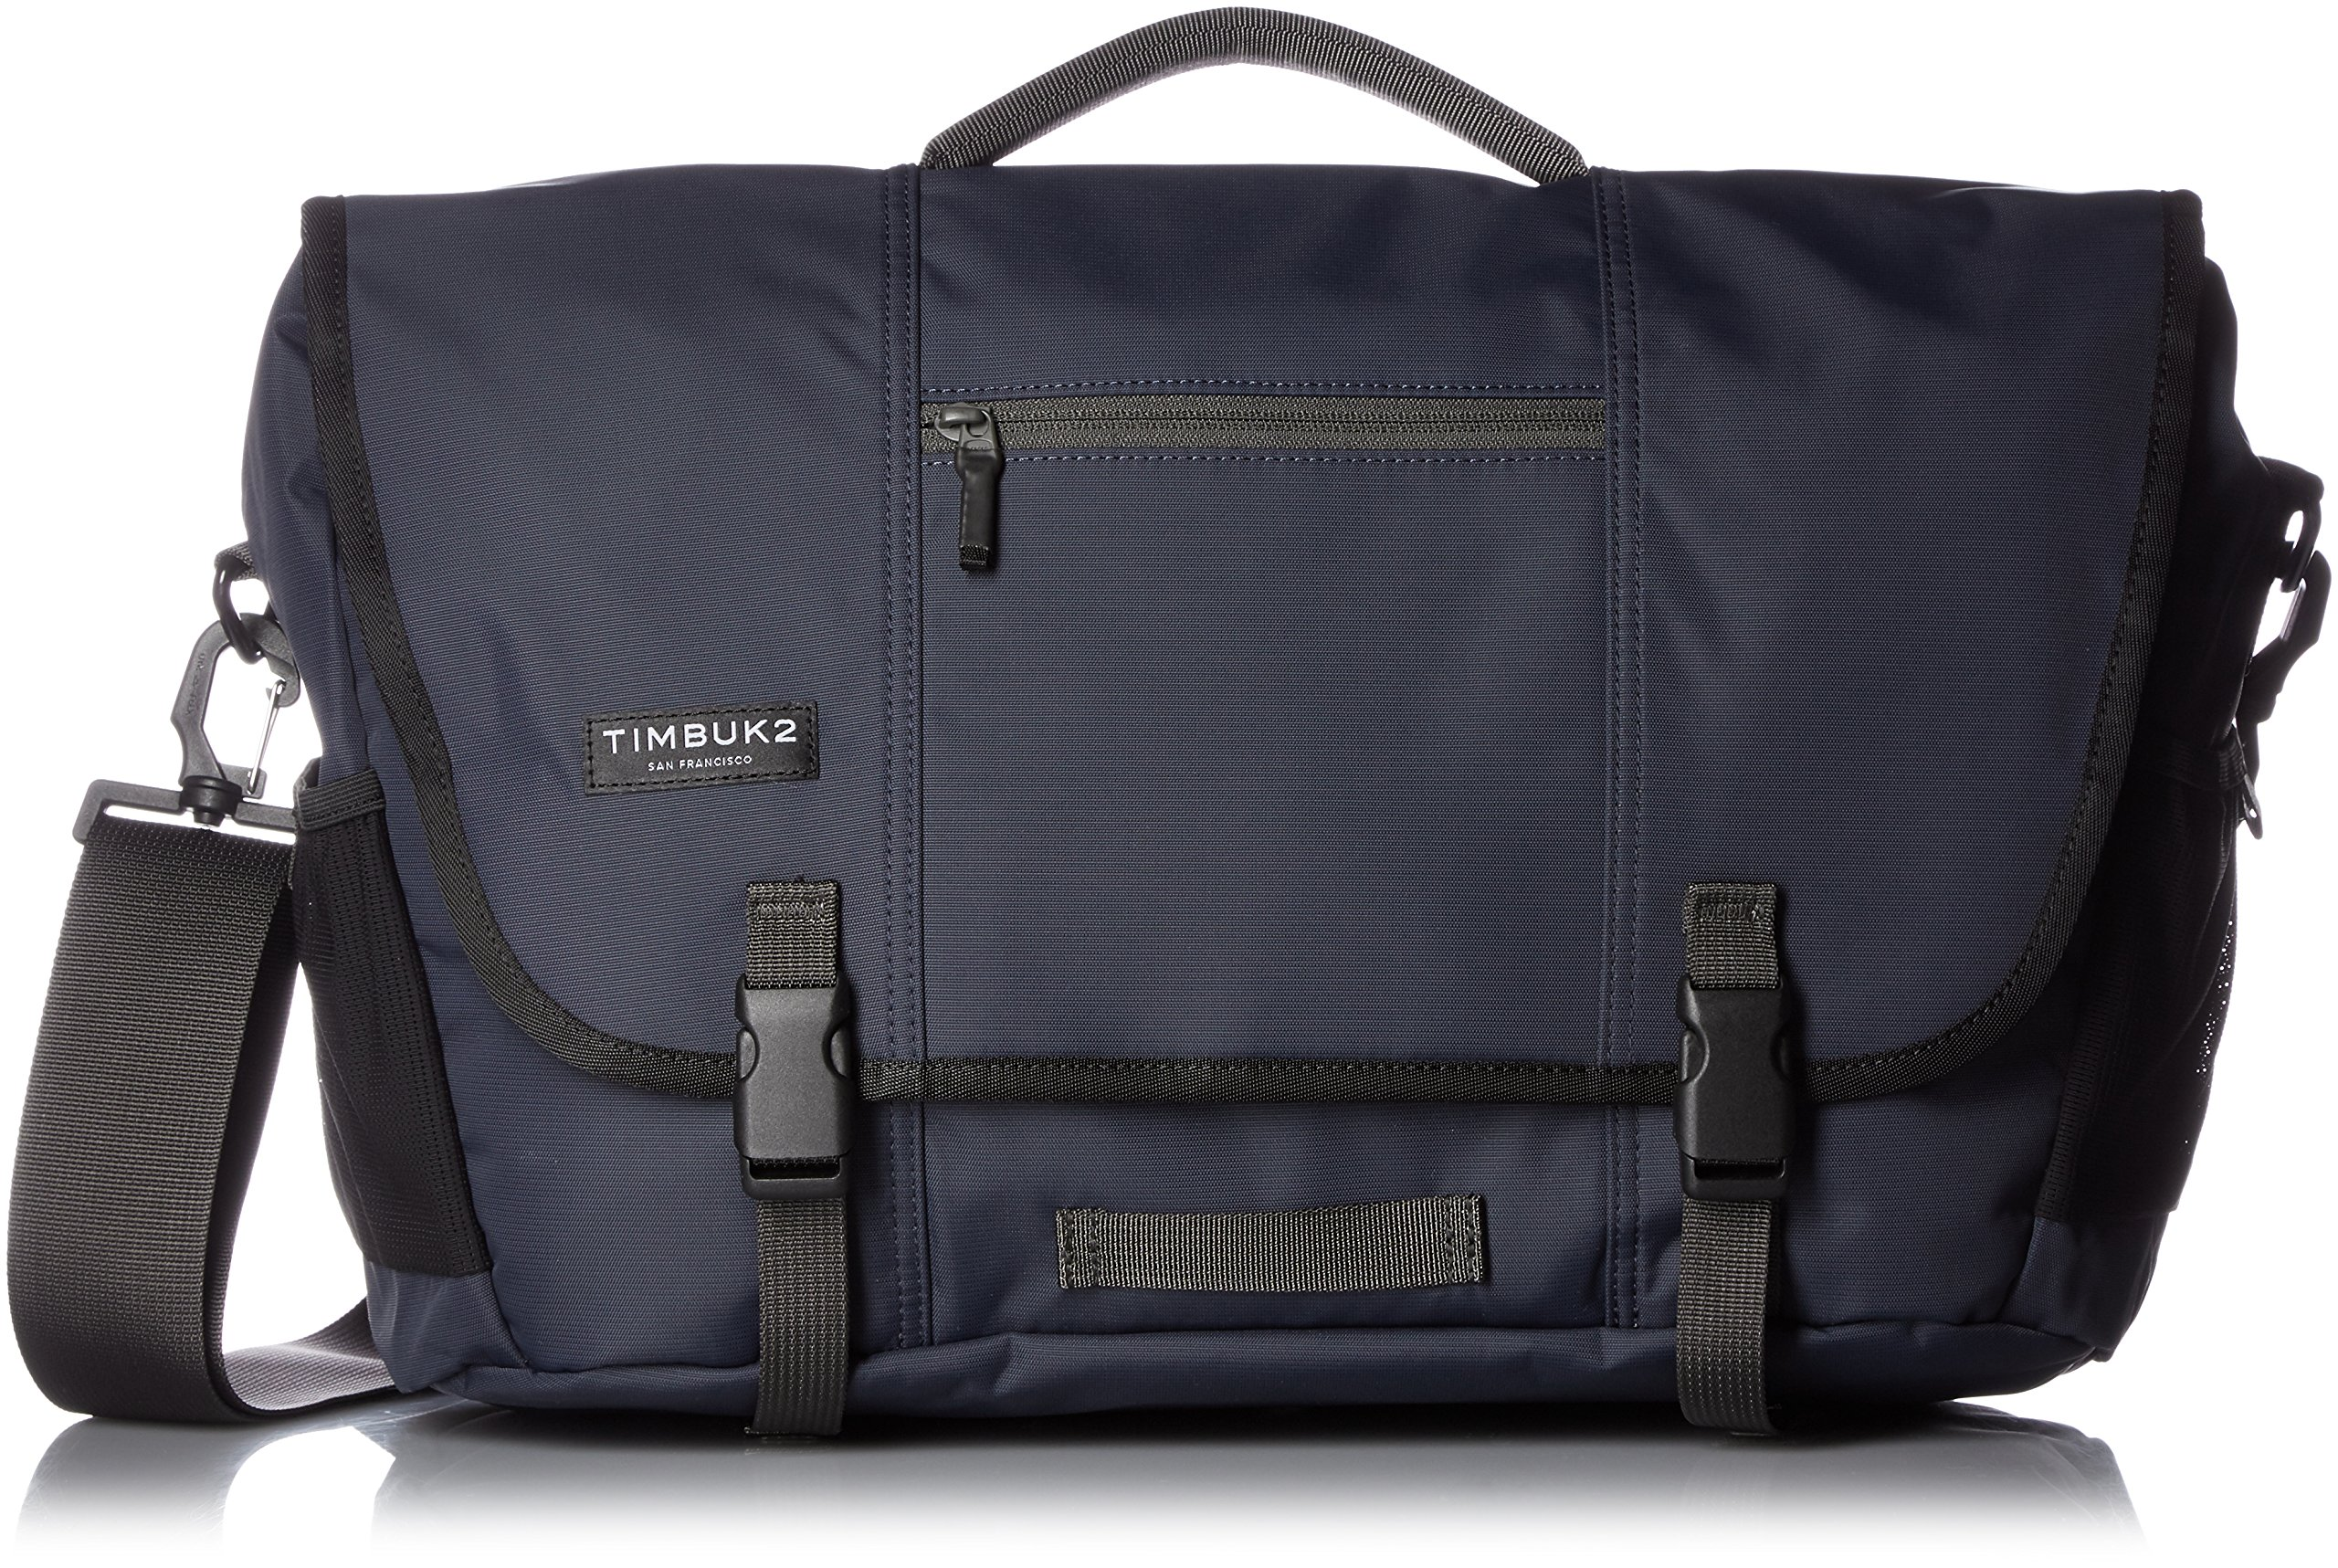 Timbuk2 Commute Messenger Bag, Nautical, M, Medium